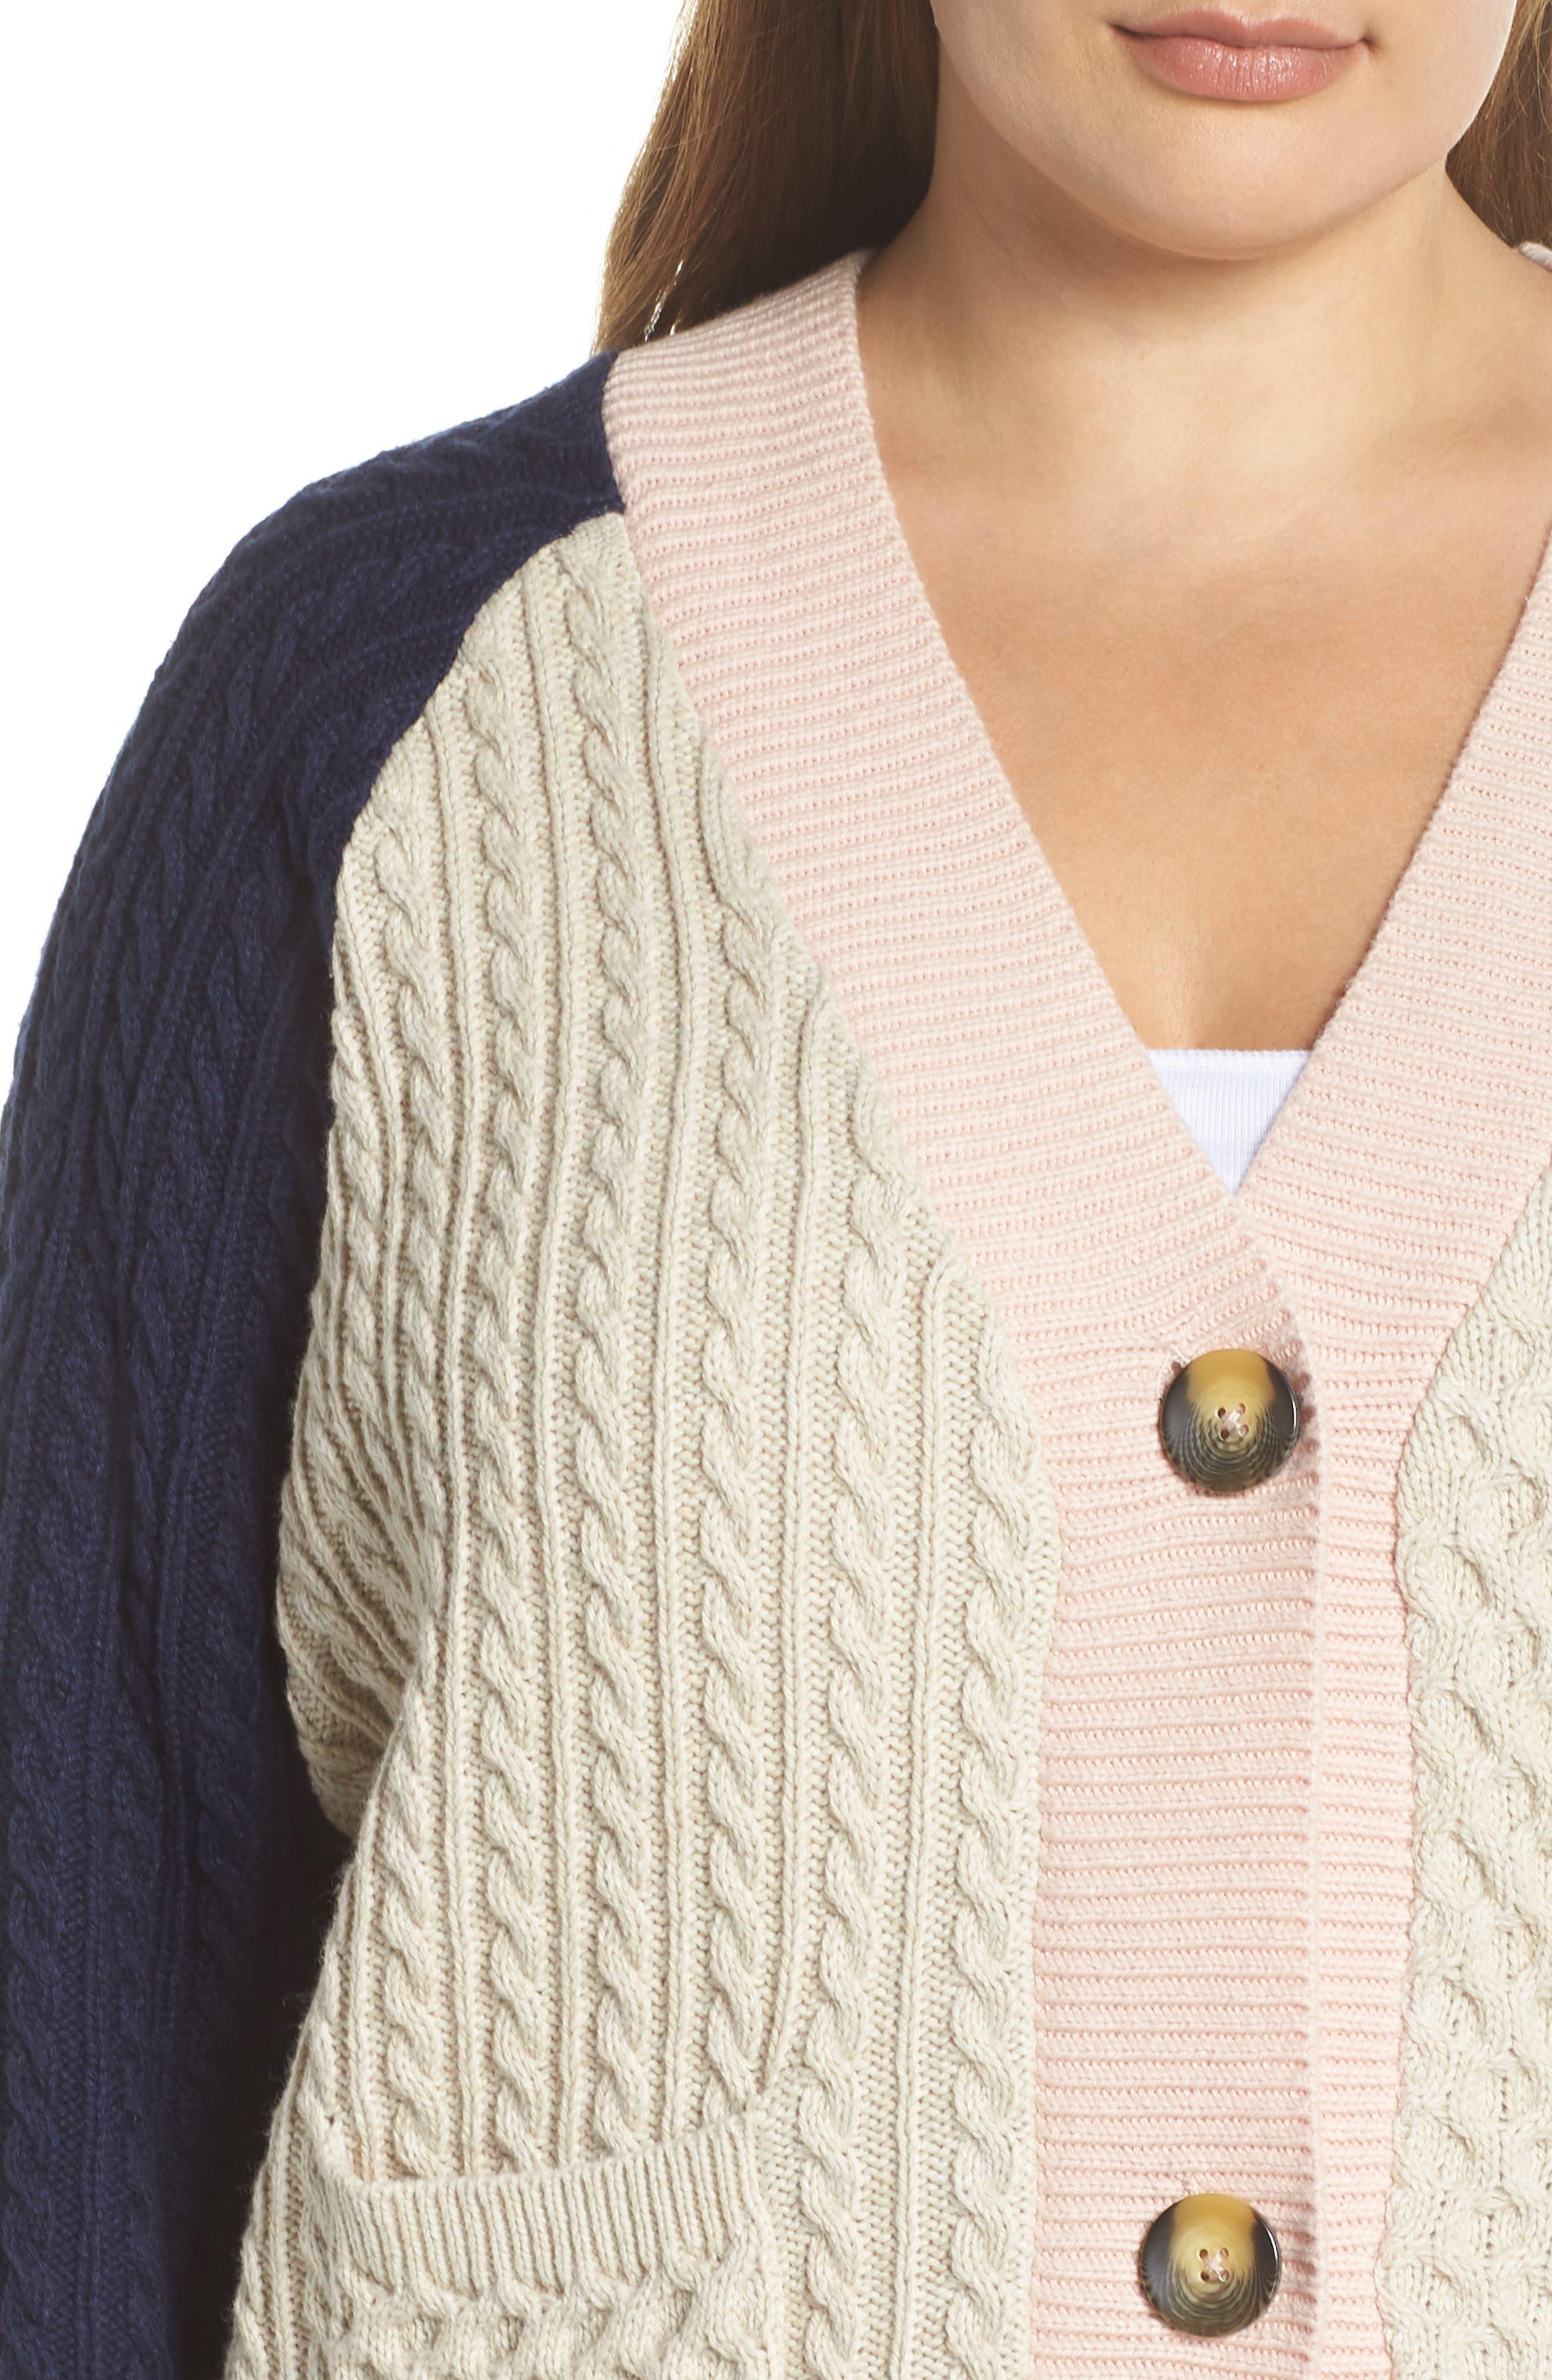 Colorblock Cable Knit Button Cardigan,                             Alternate thumbnail 4, color,                             900